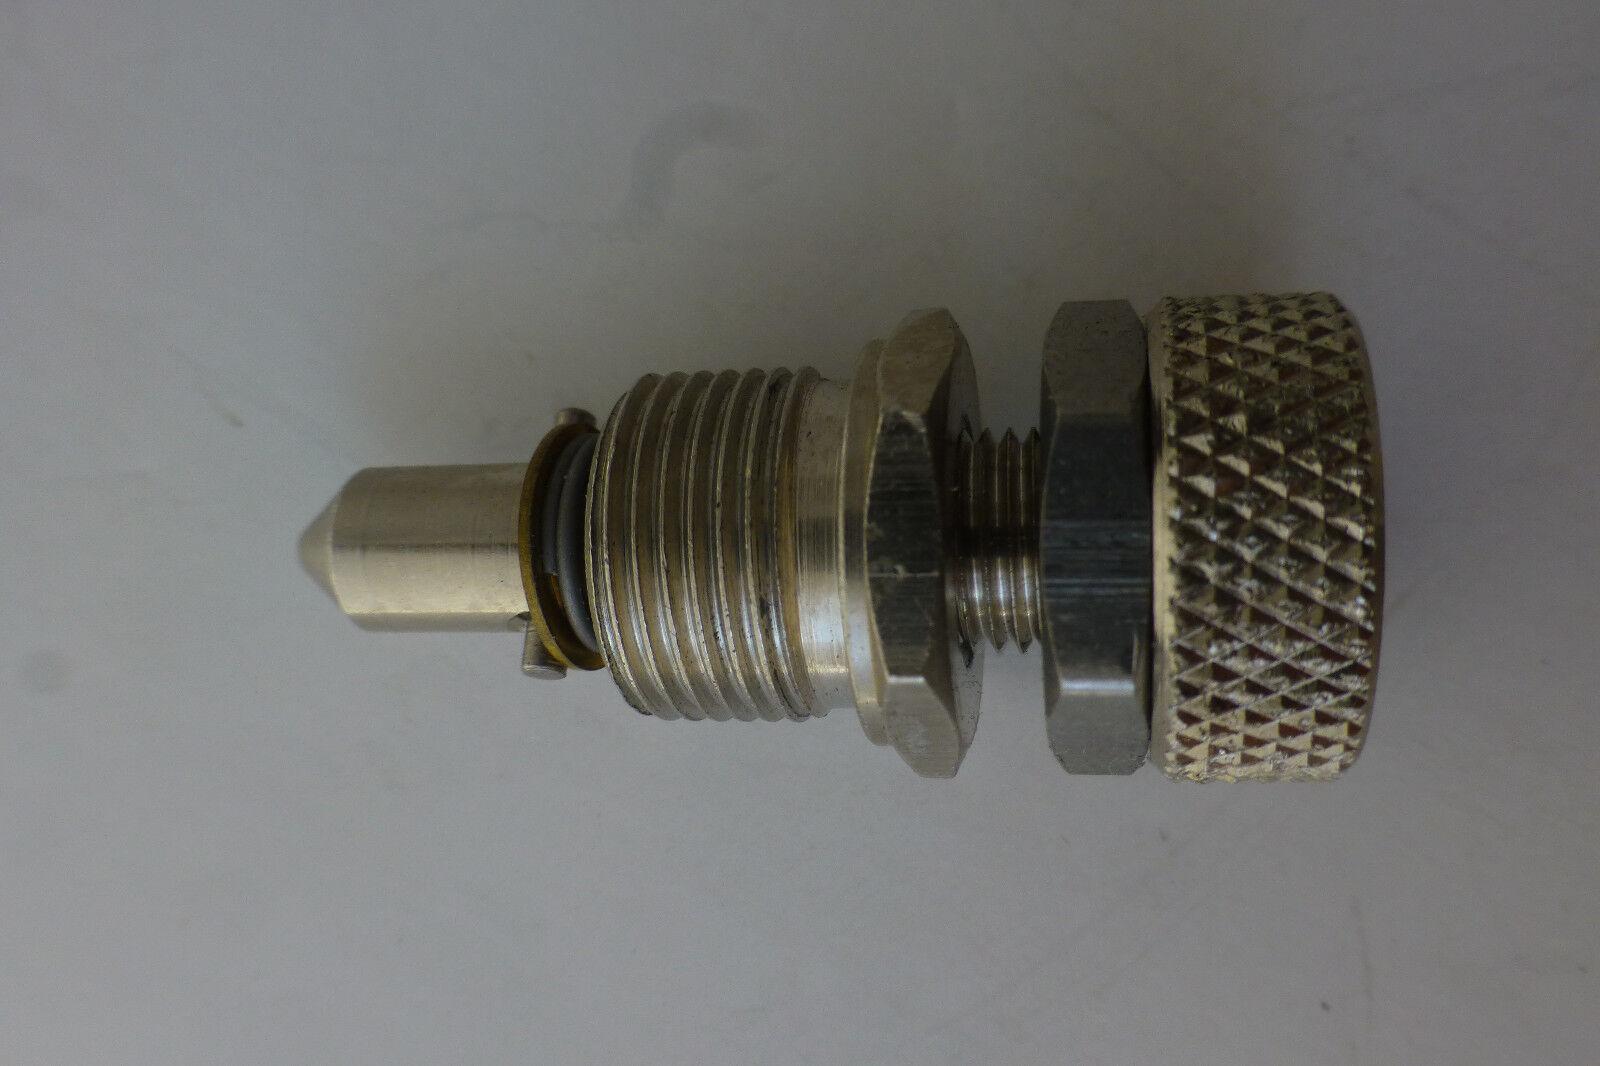 bin 151 binks 54-3720 side port control assembly for binks mach 1a hvlp automa